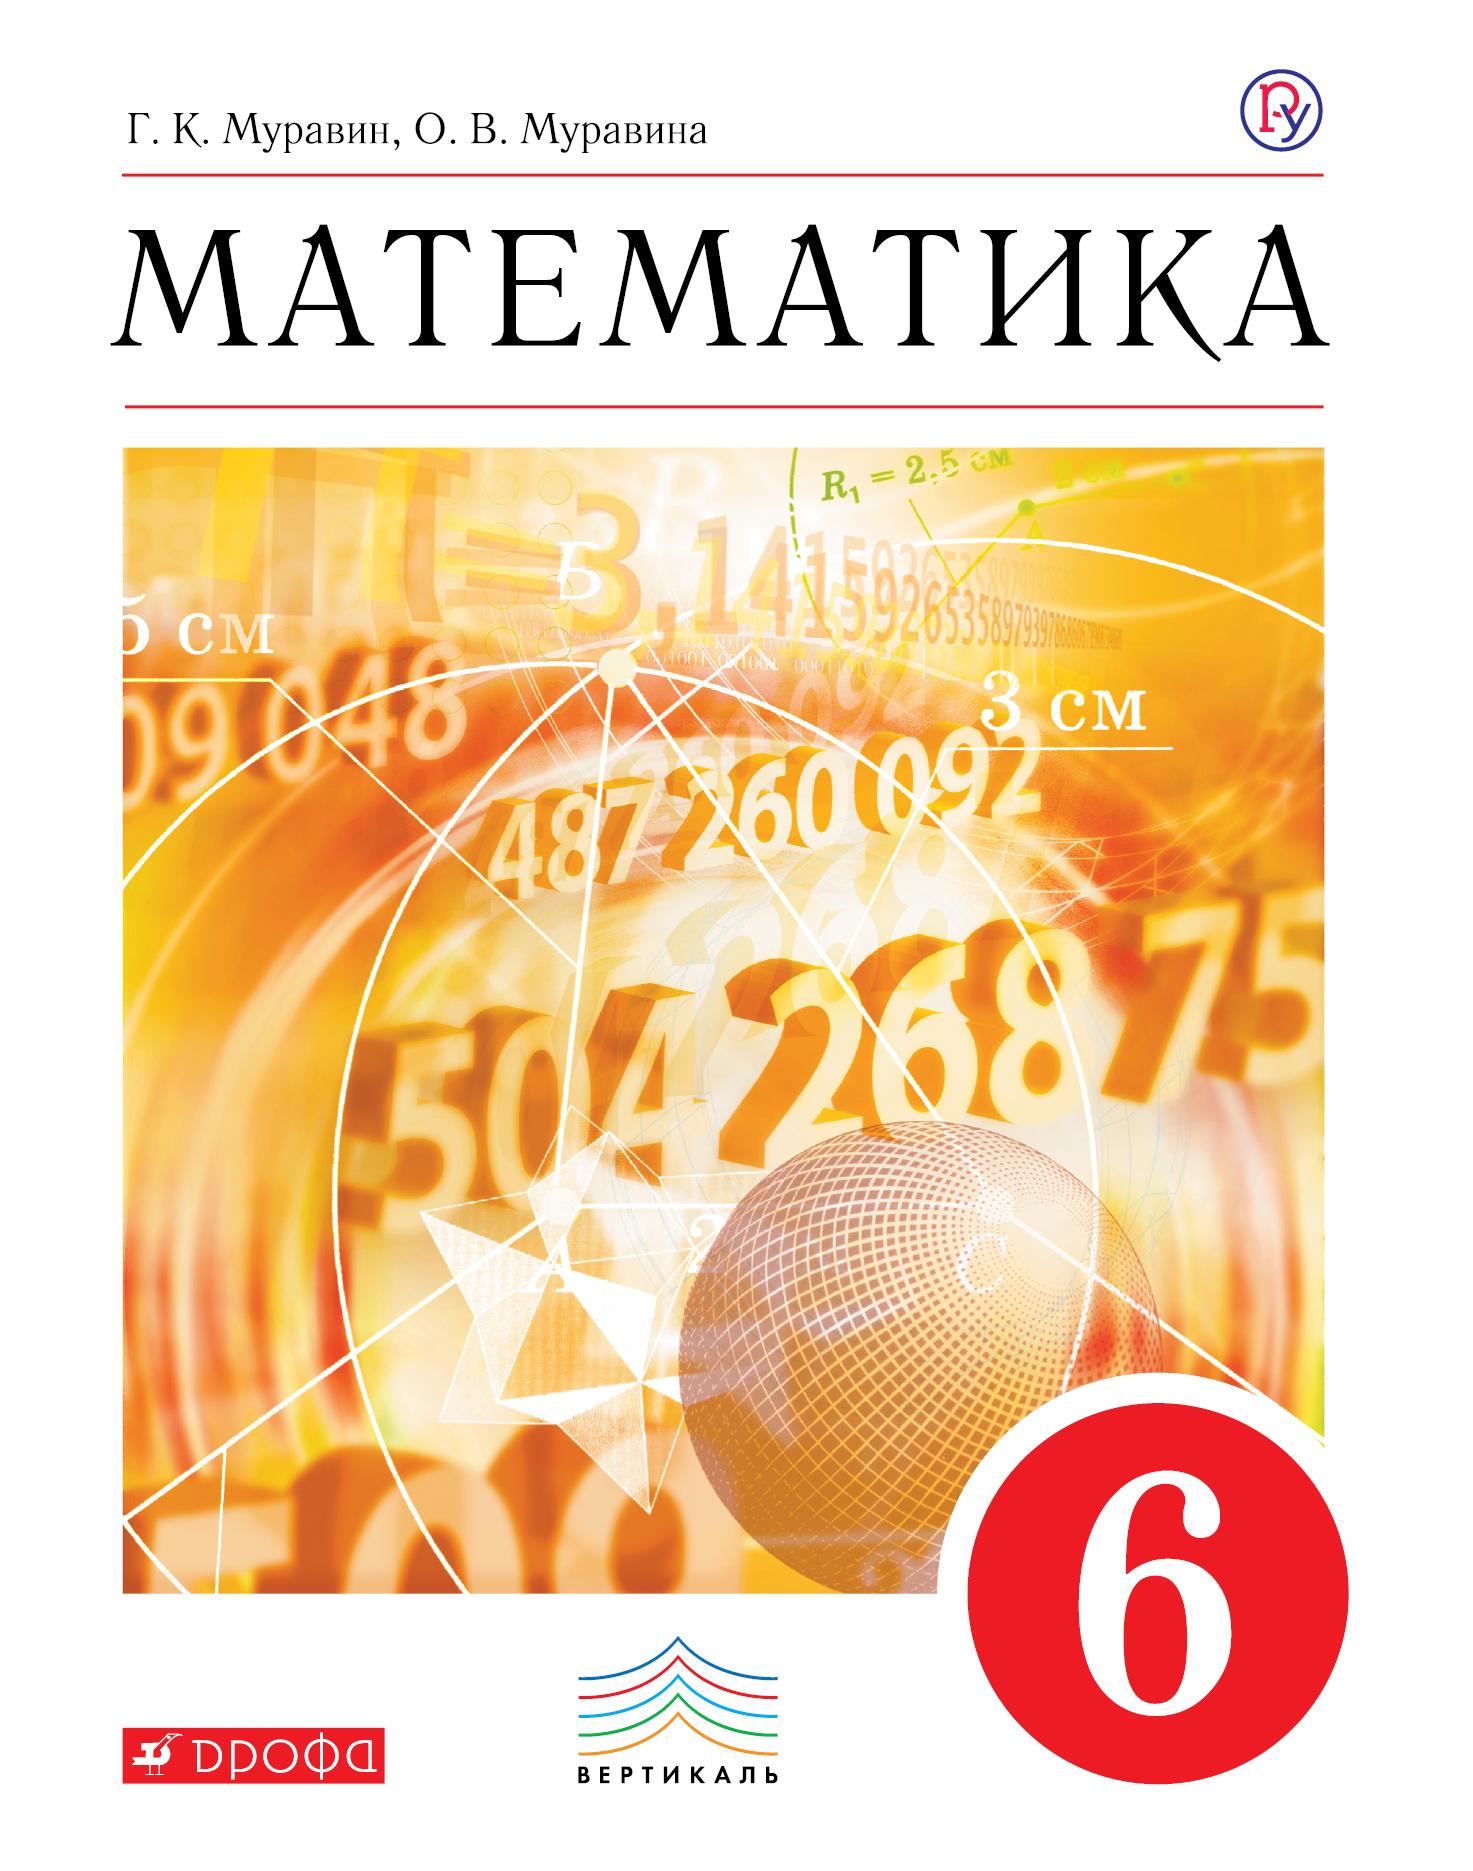 Математика. 6 класс. Учебник ( Муравин Георгий Константинович, Муравина Ольга Викторовна  )